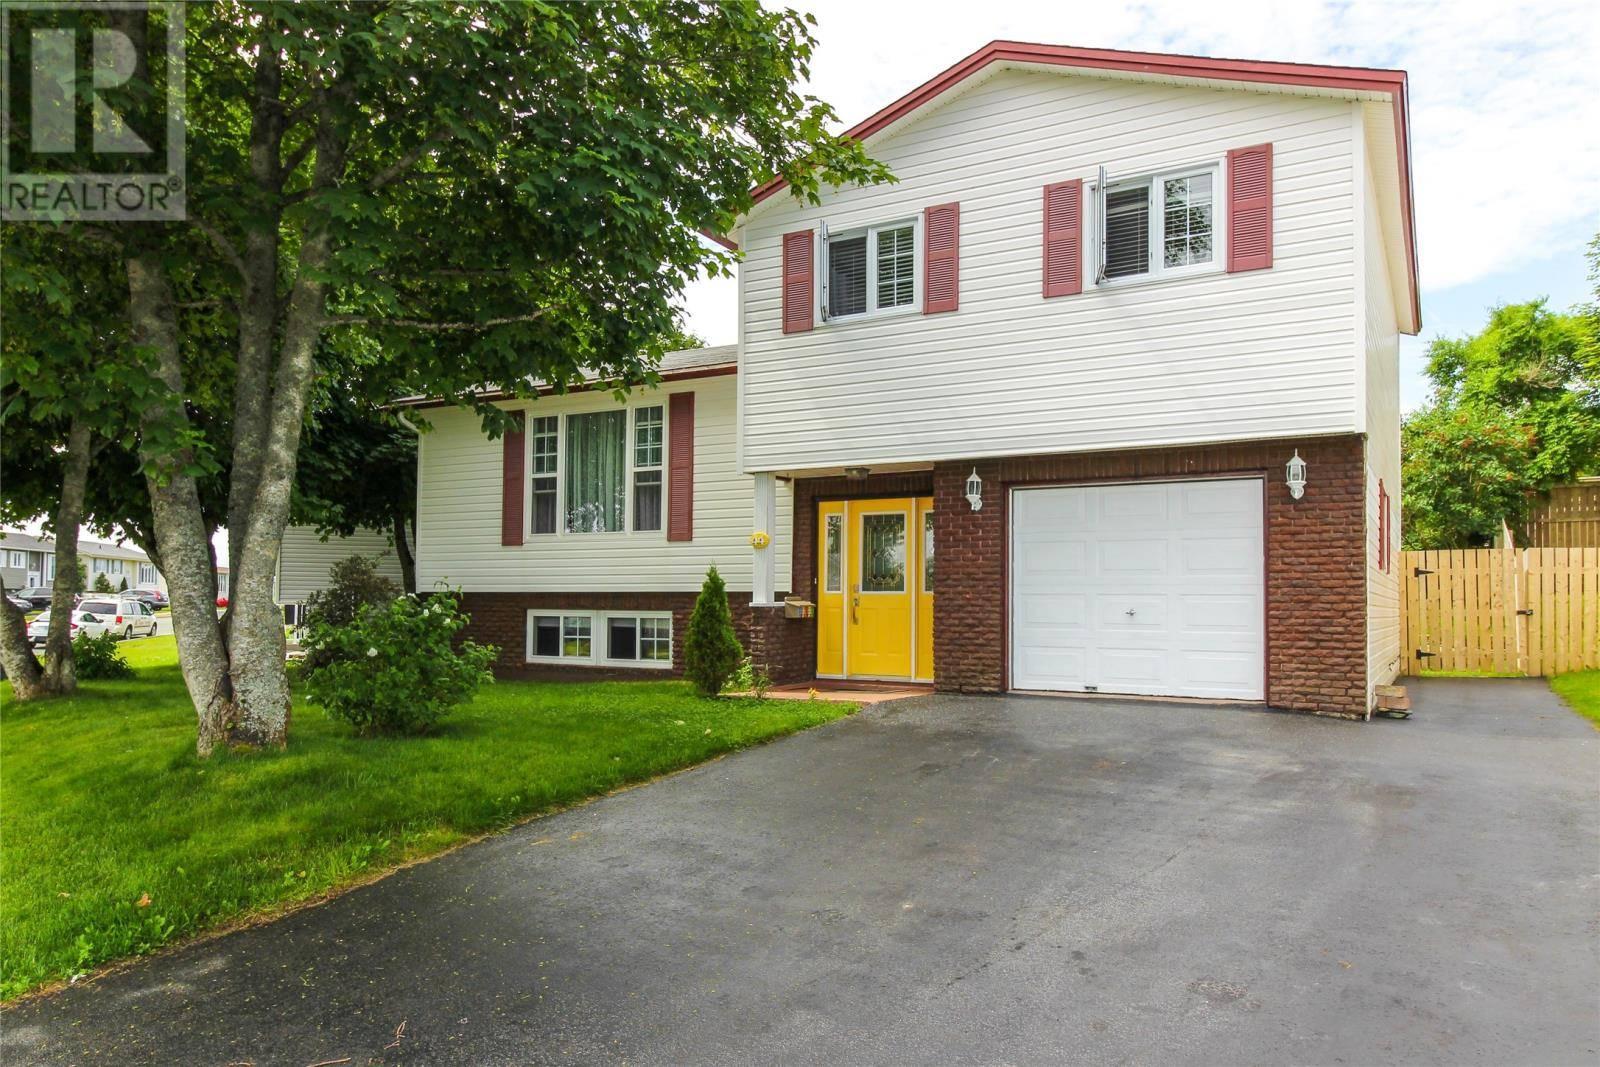 House for sale at 44 Munden Dr Mount Pearl Newfoundland - MLS: 1200300